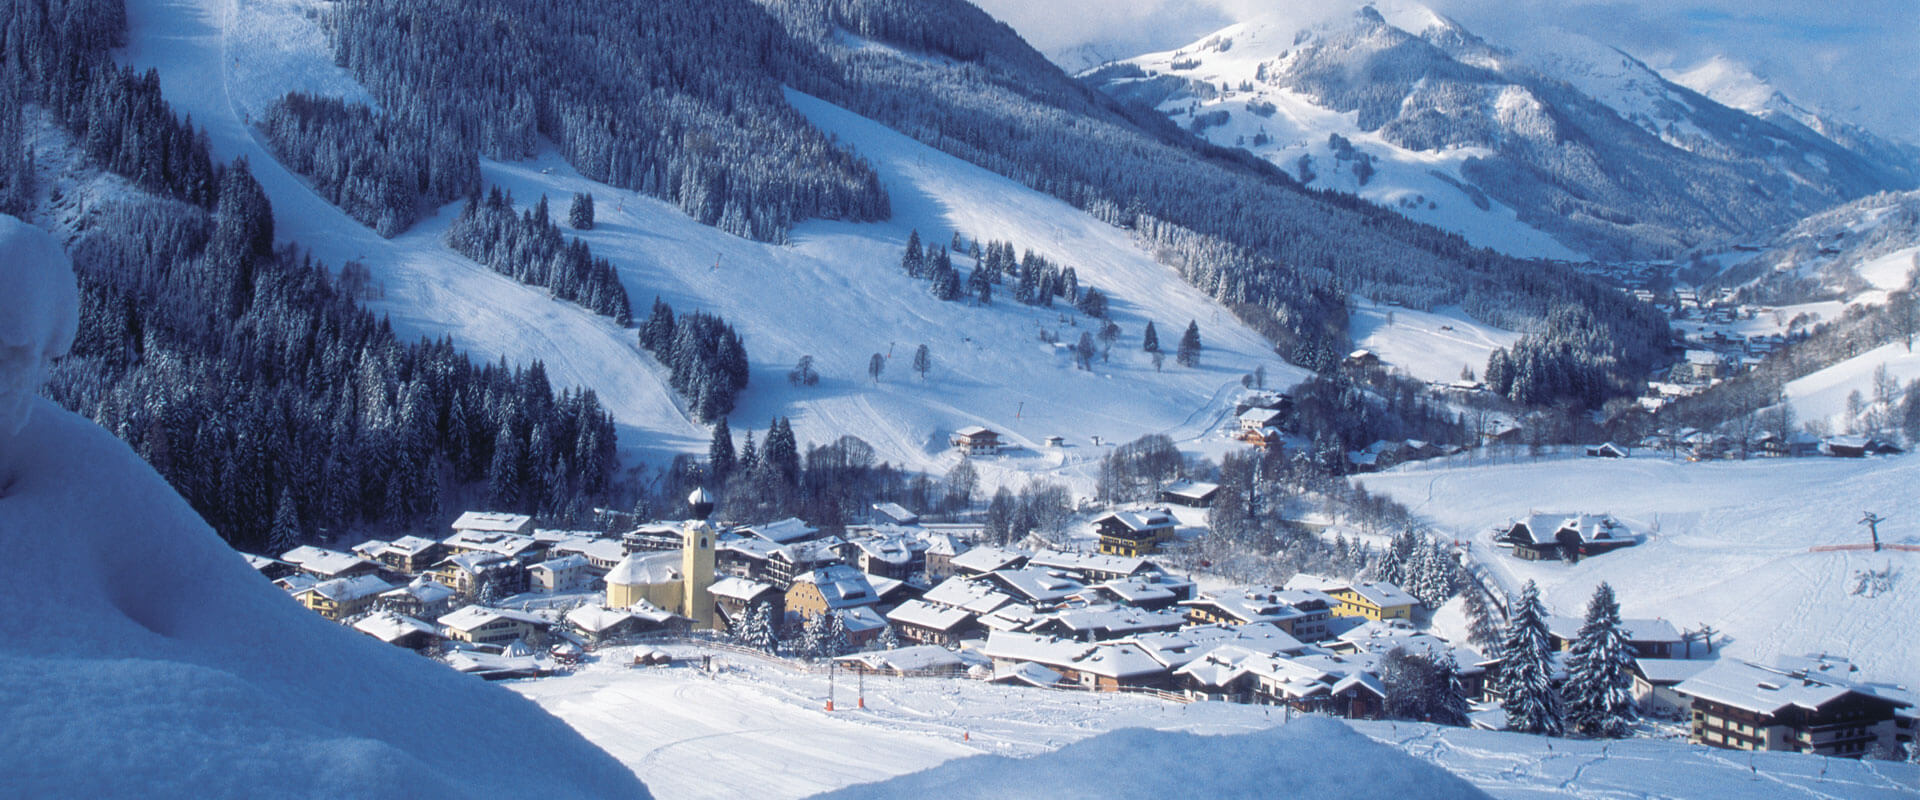 Ski hire in Saalbach 0b39cca2c4